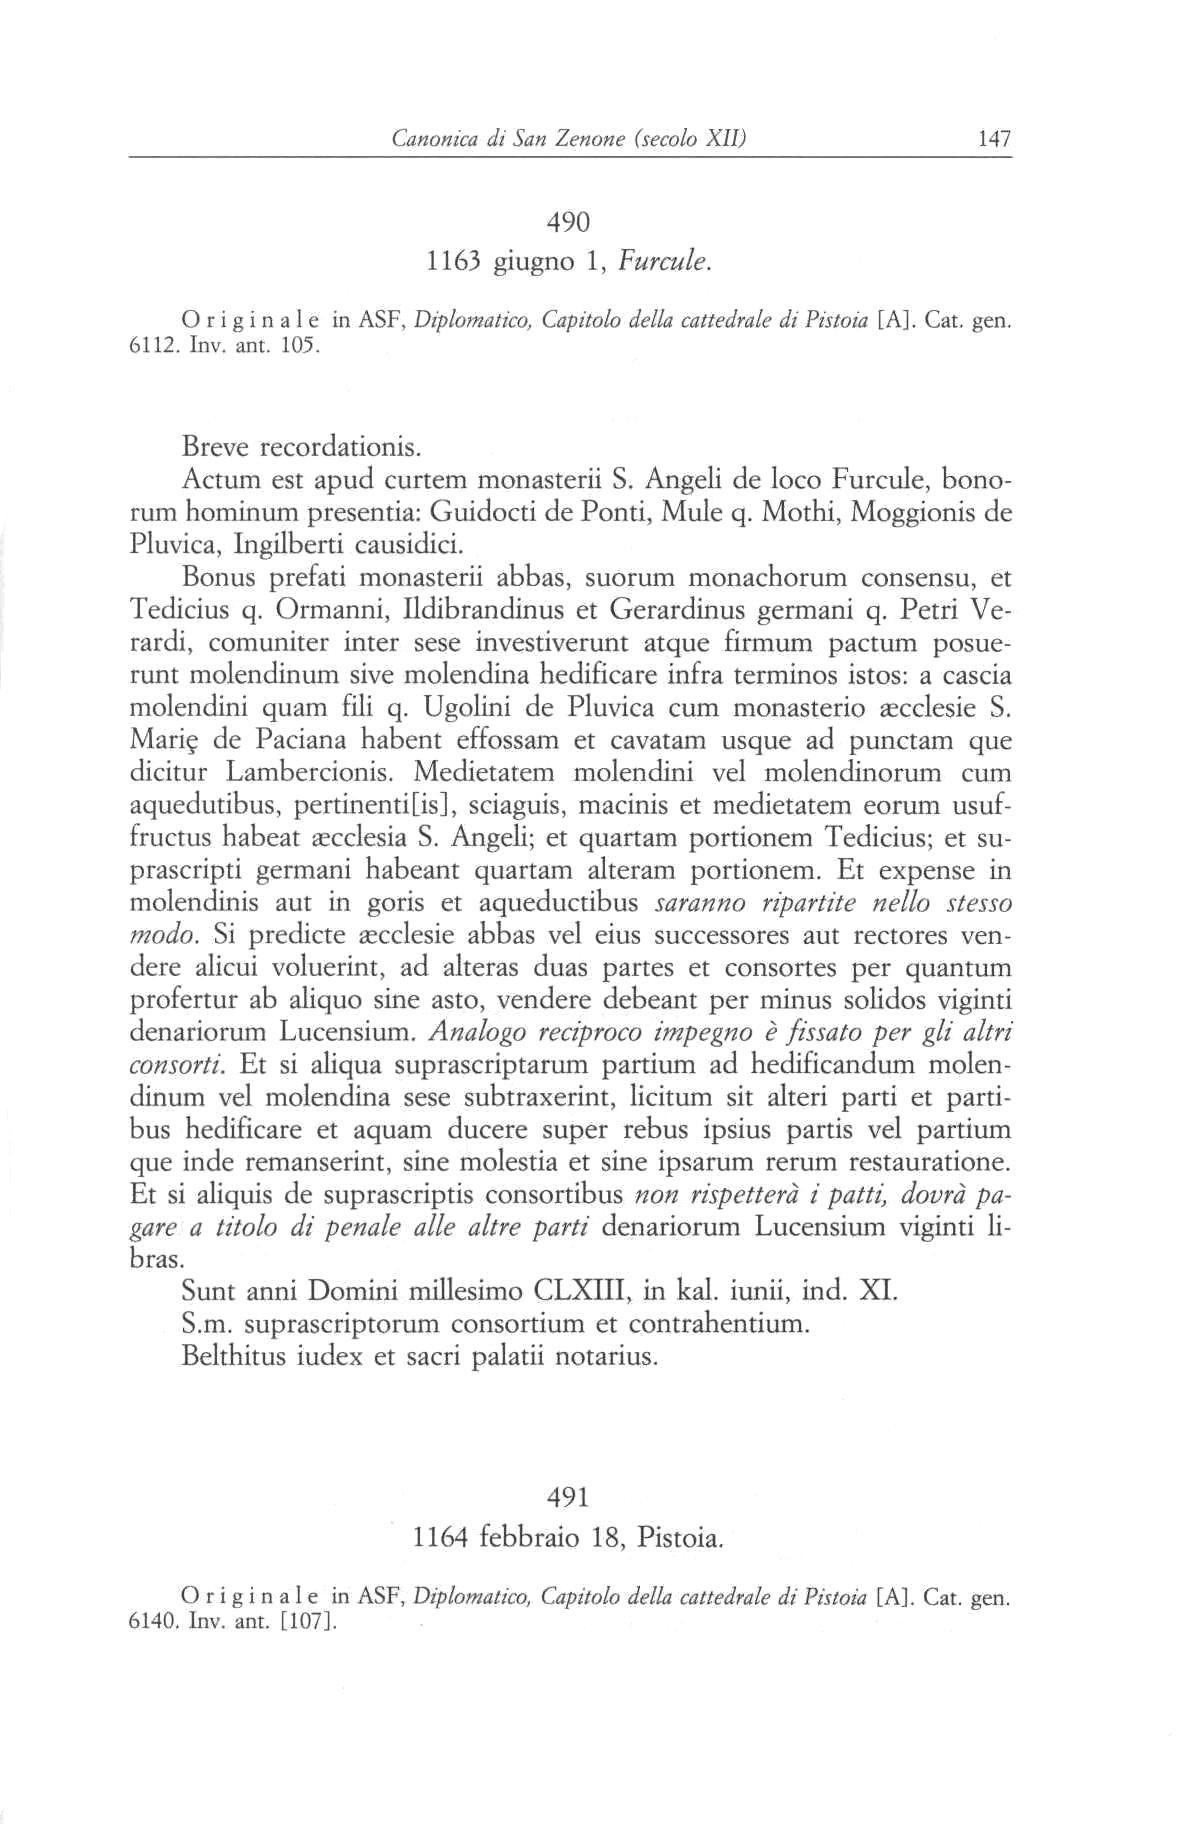 Canonica S. Zenone XII 0147.jpg